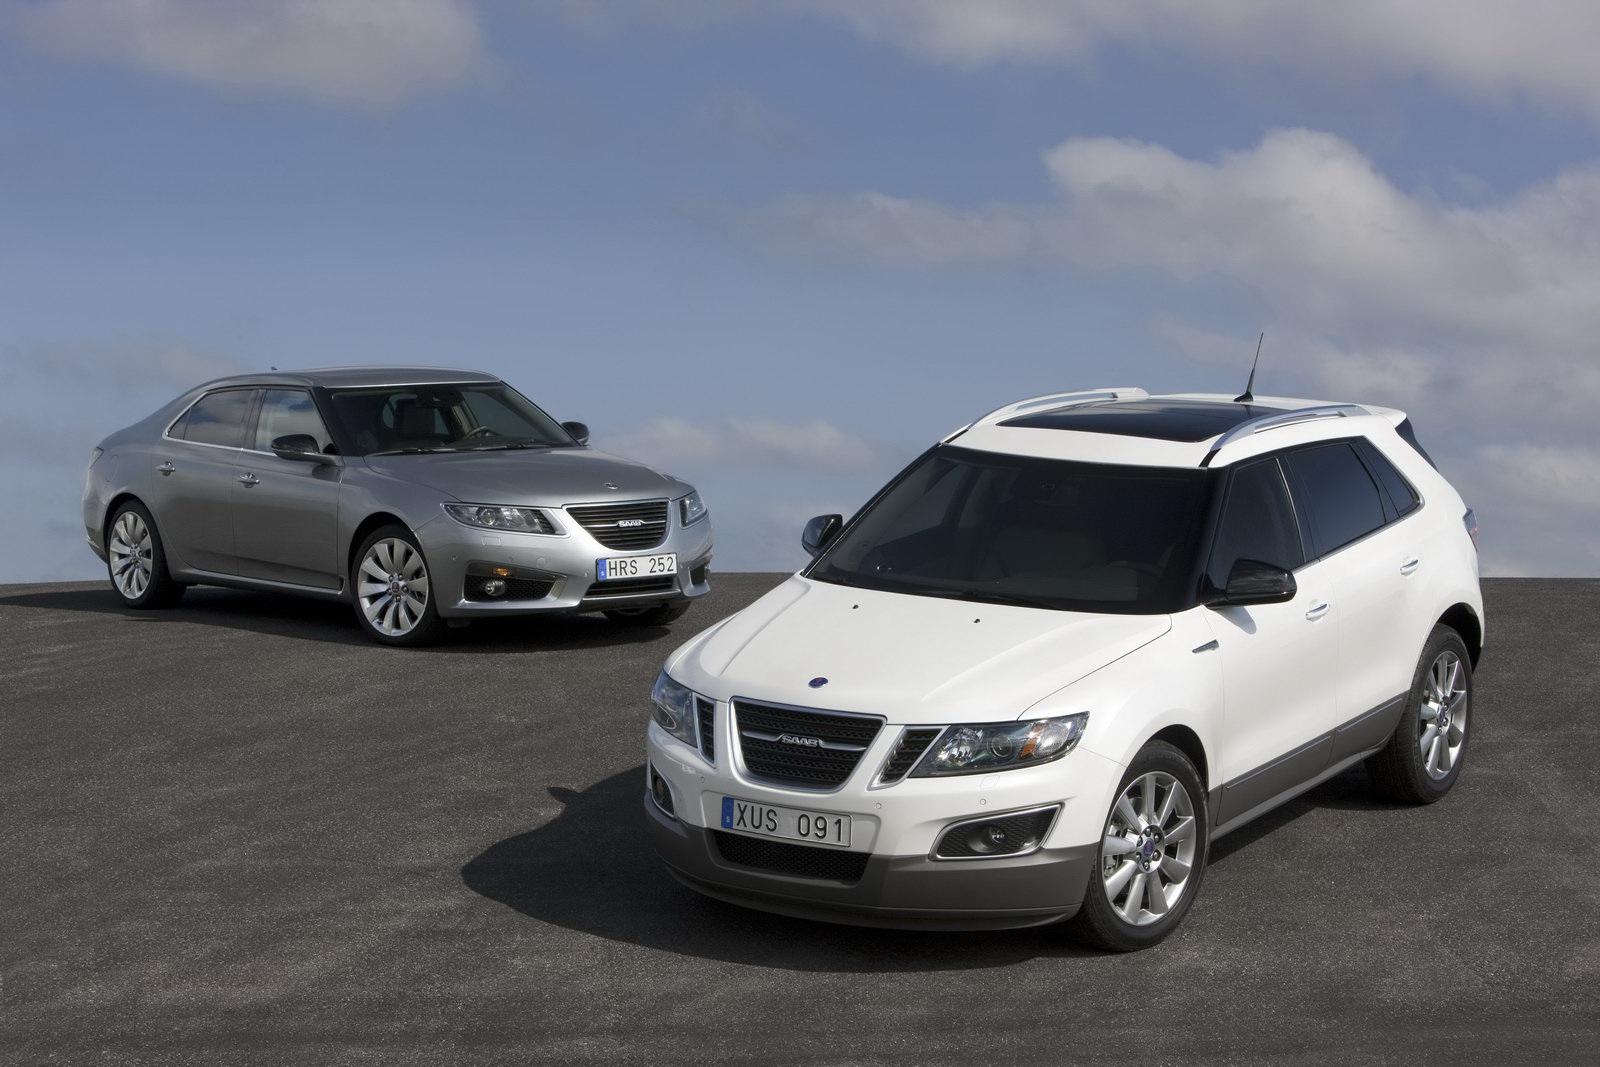 New Chrysler 200 Convertible And Hyundai Elantra In La